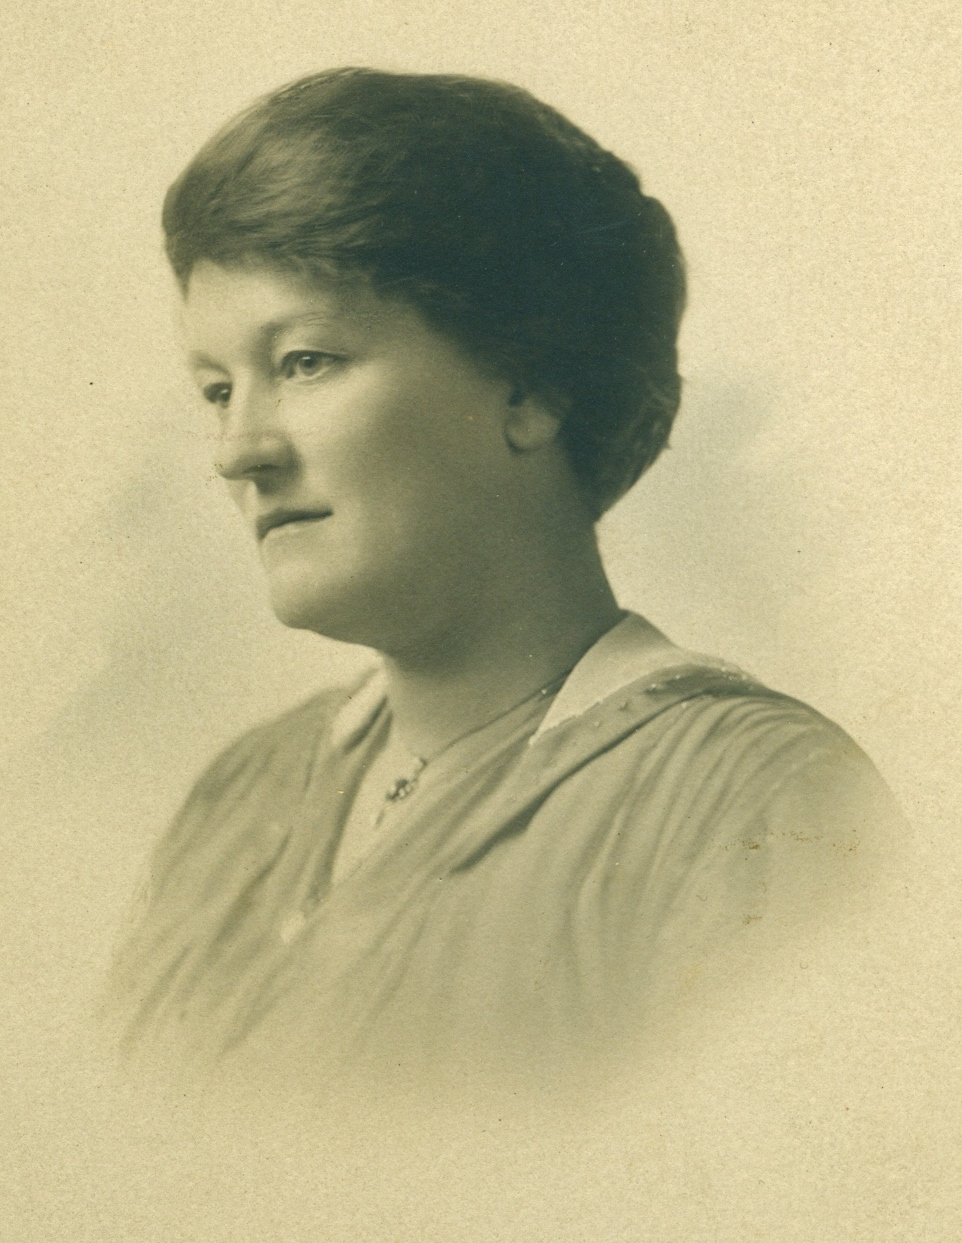 Mrs. (Ada Maitland) Mackecknie was born in 1875